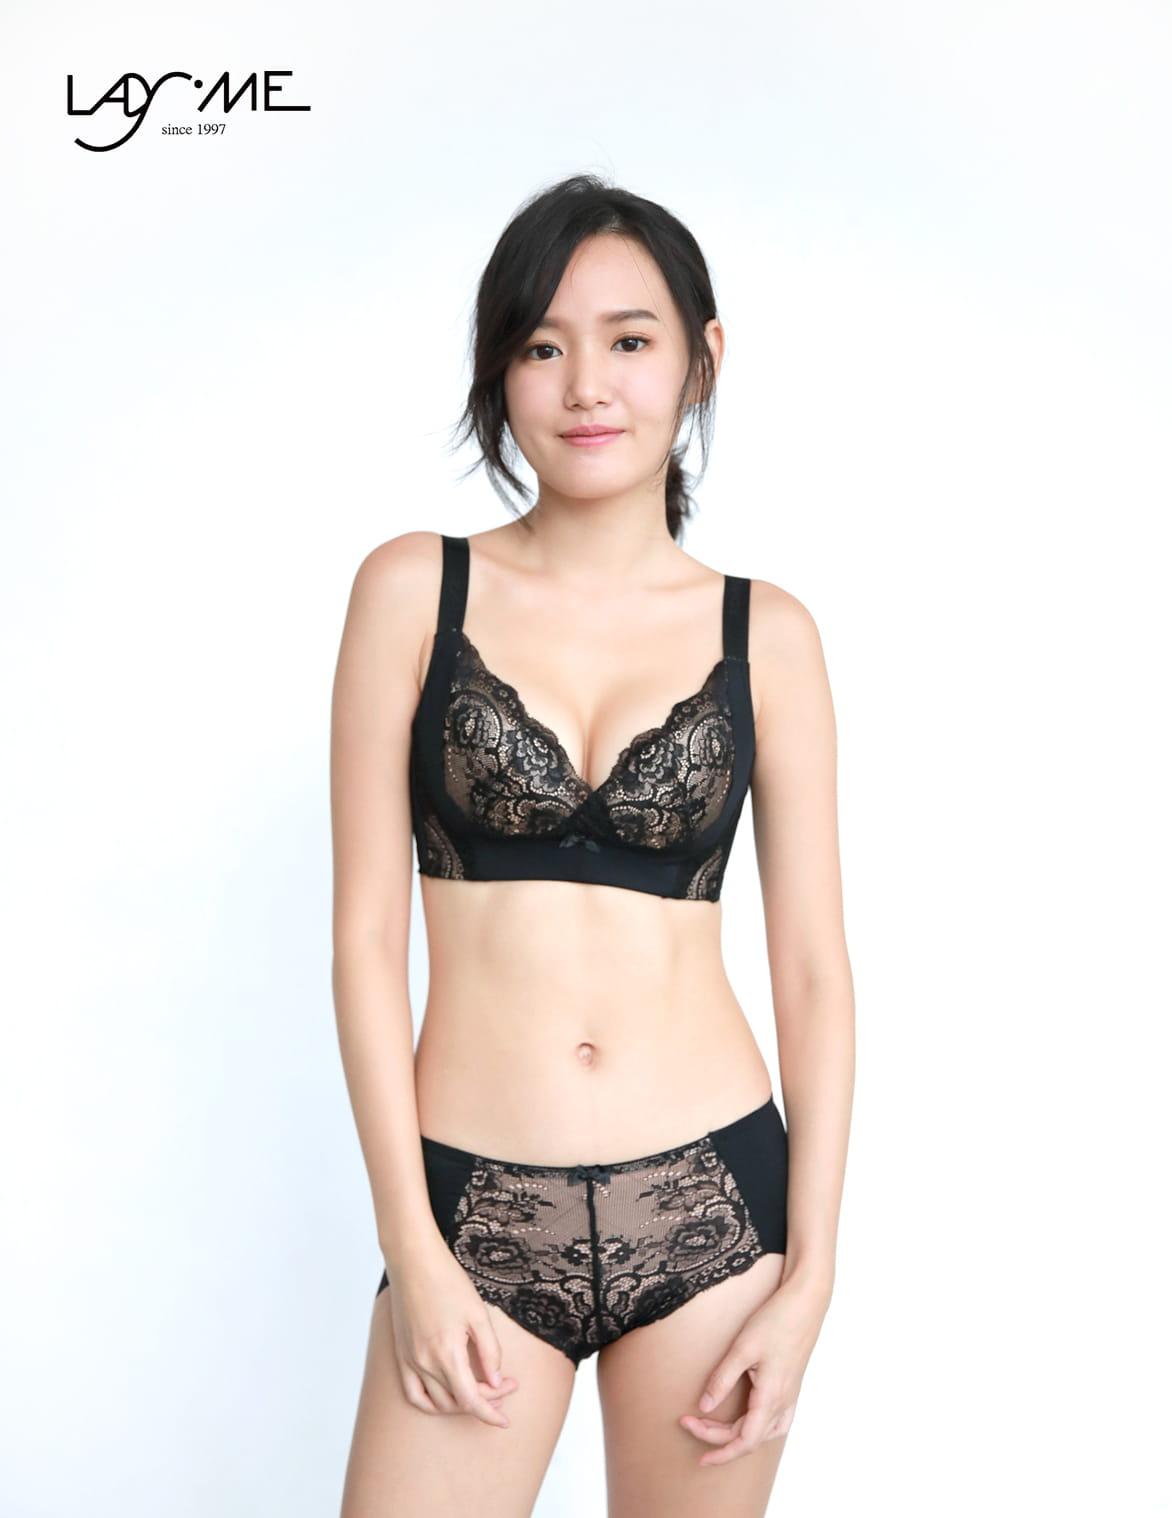 【LadyMe】【大罩杯】巴黎情人-浪漫黑 0